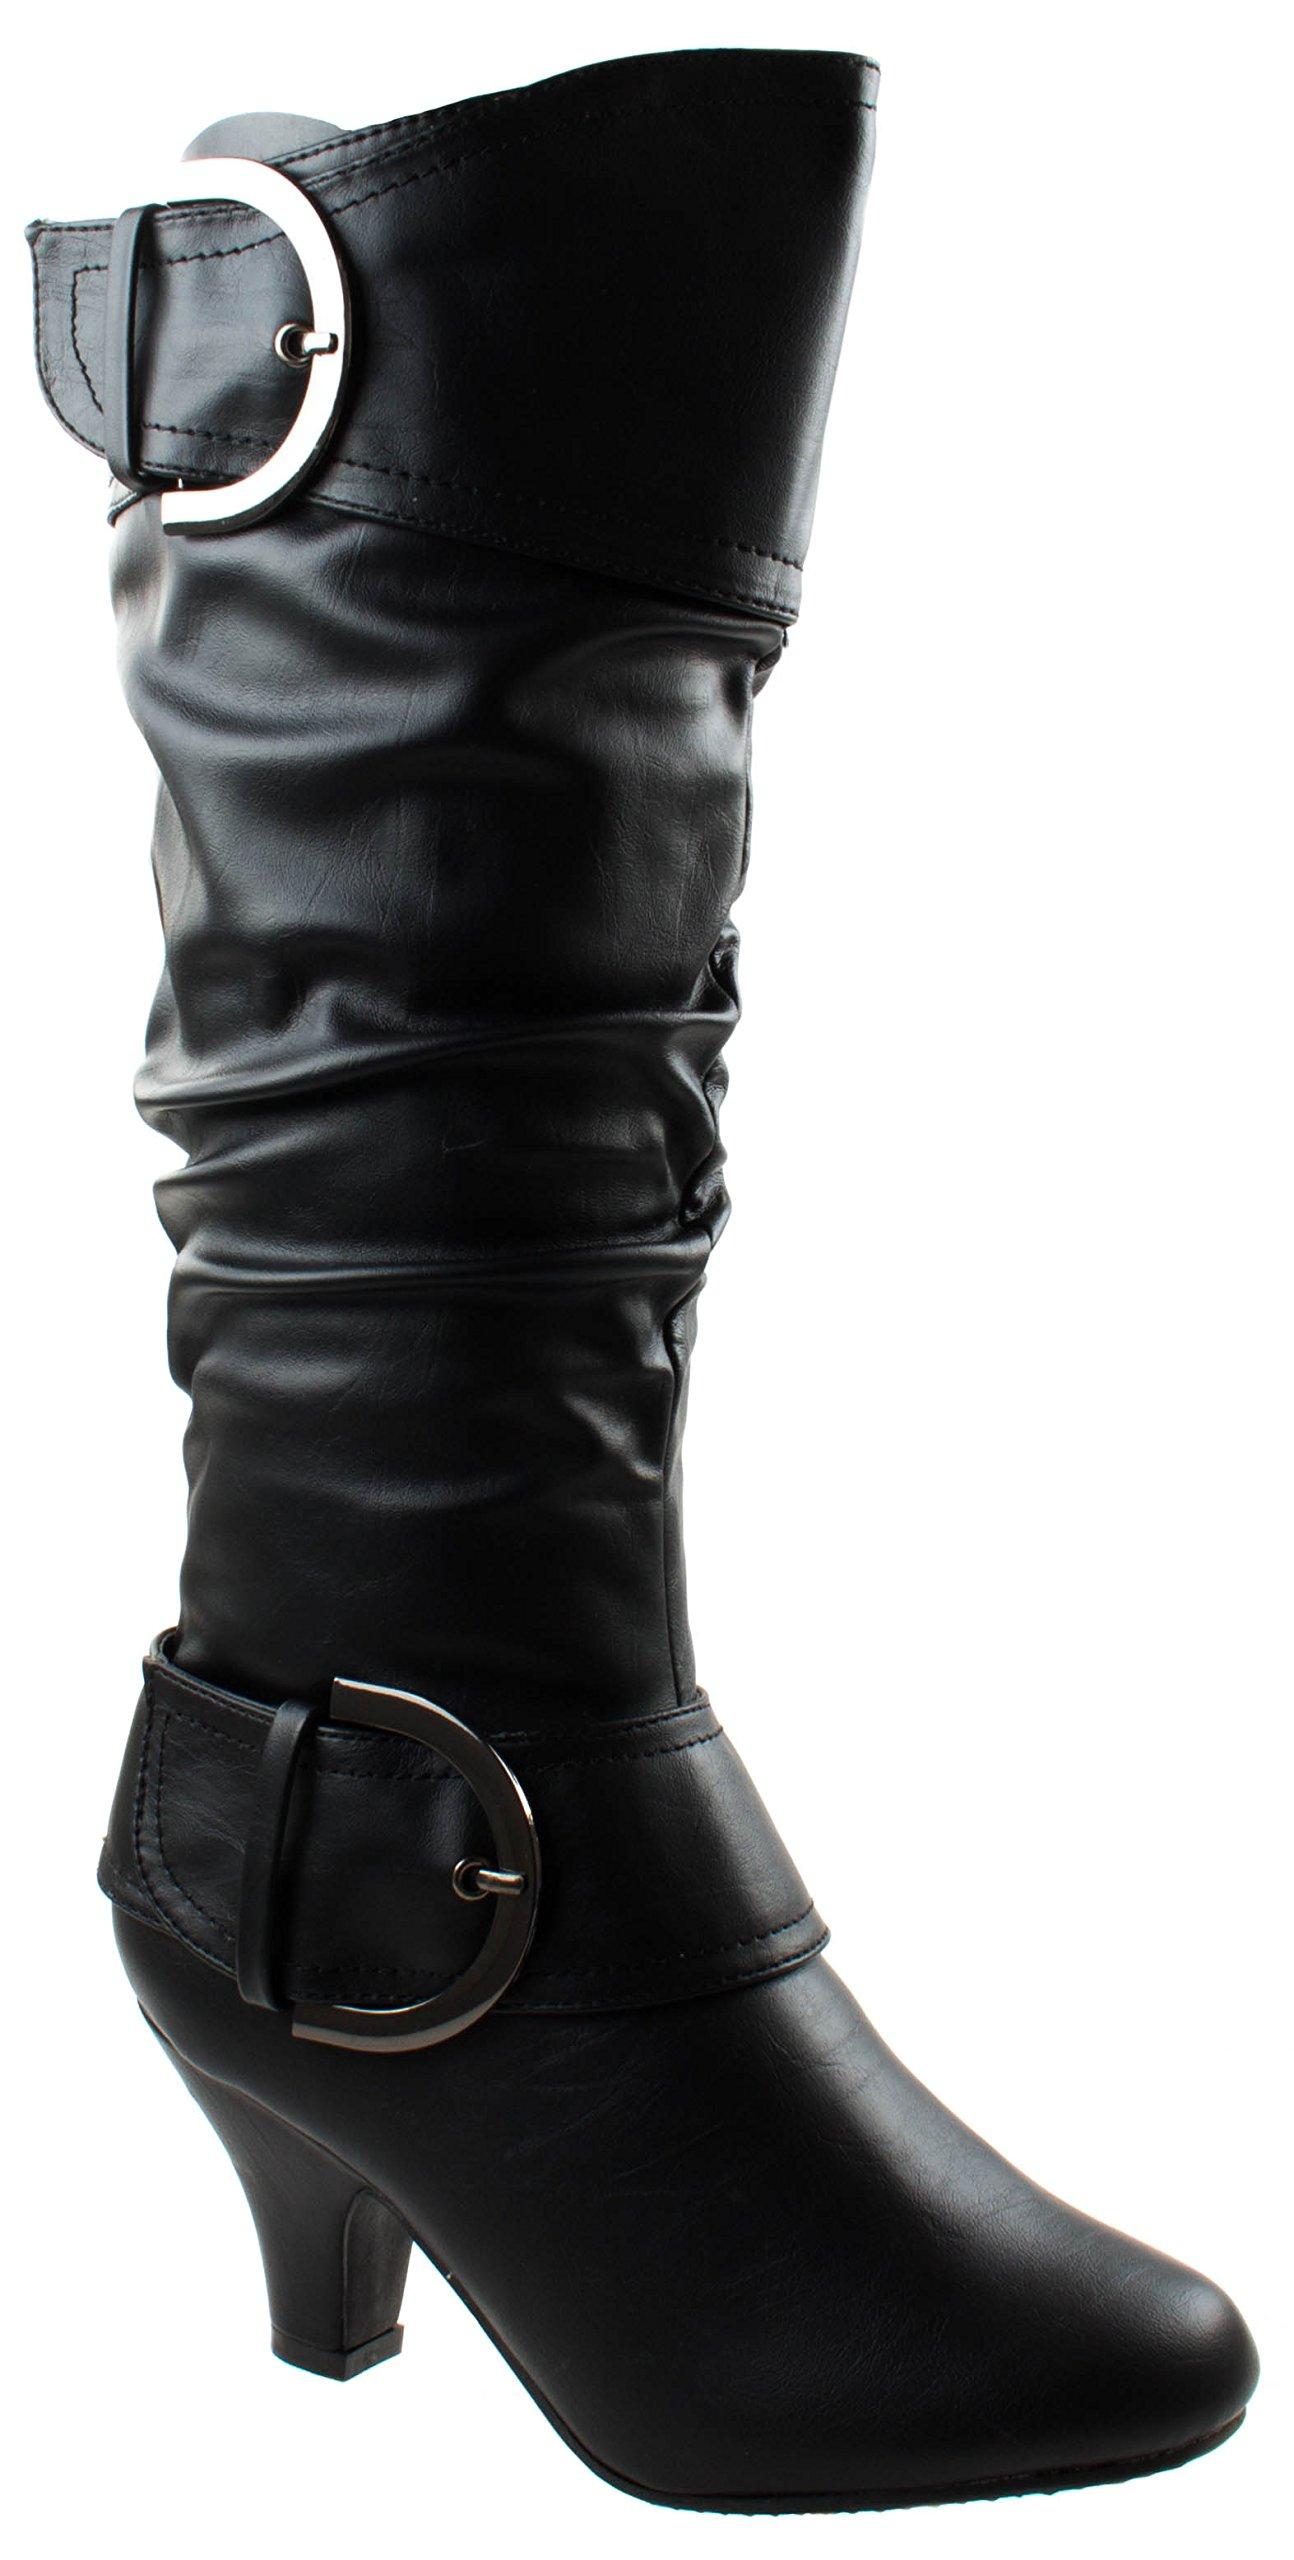 Top Moda Women's Auto-9 Black PU Round Toe Kitten Heel Mid Calf Boots with Buckle Decoration 5.5 D(M) US